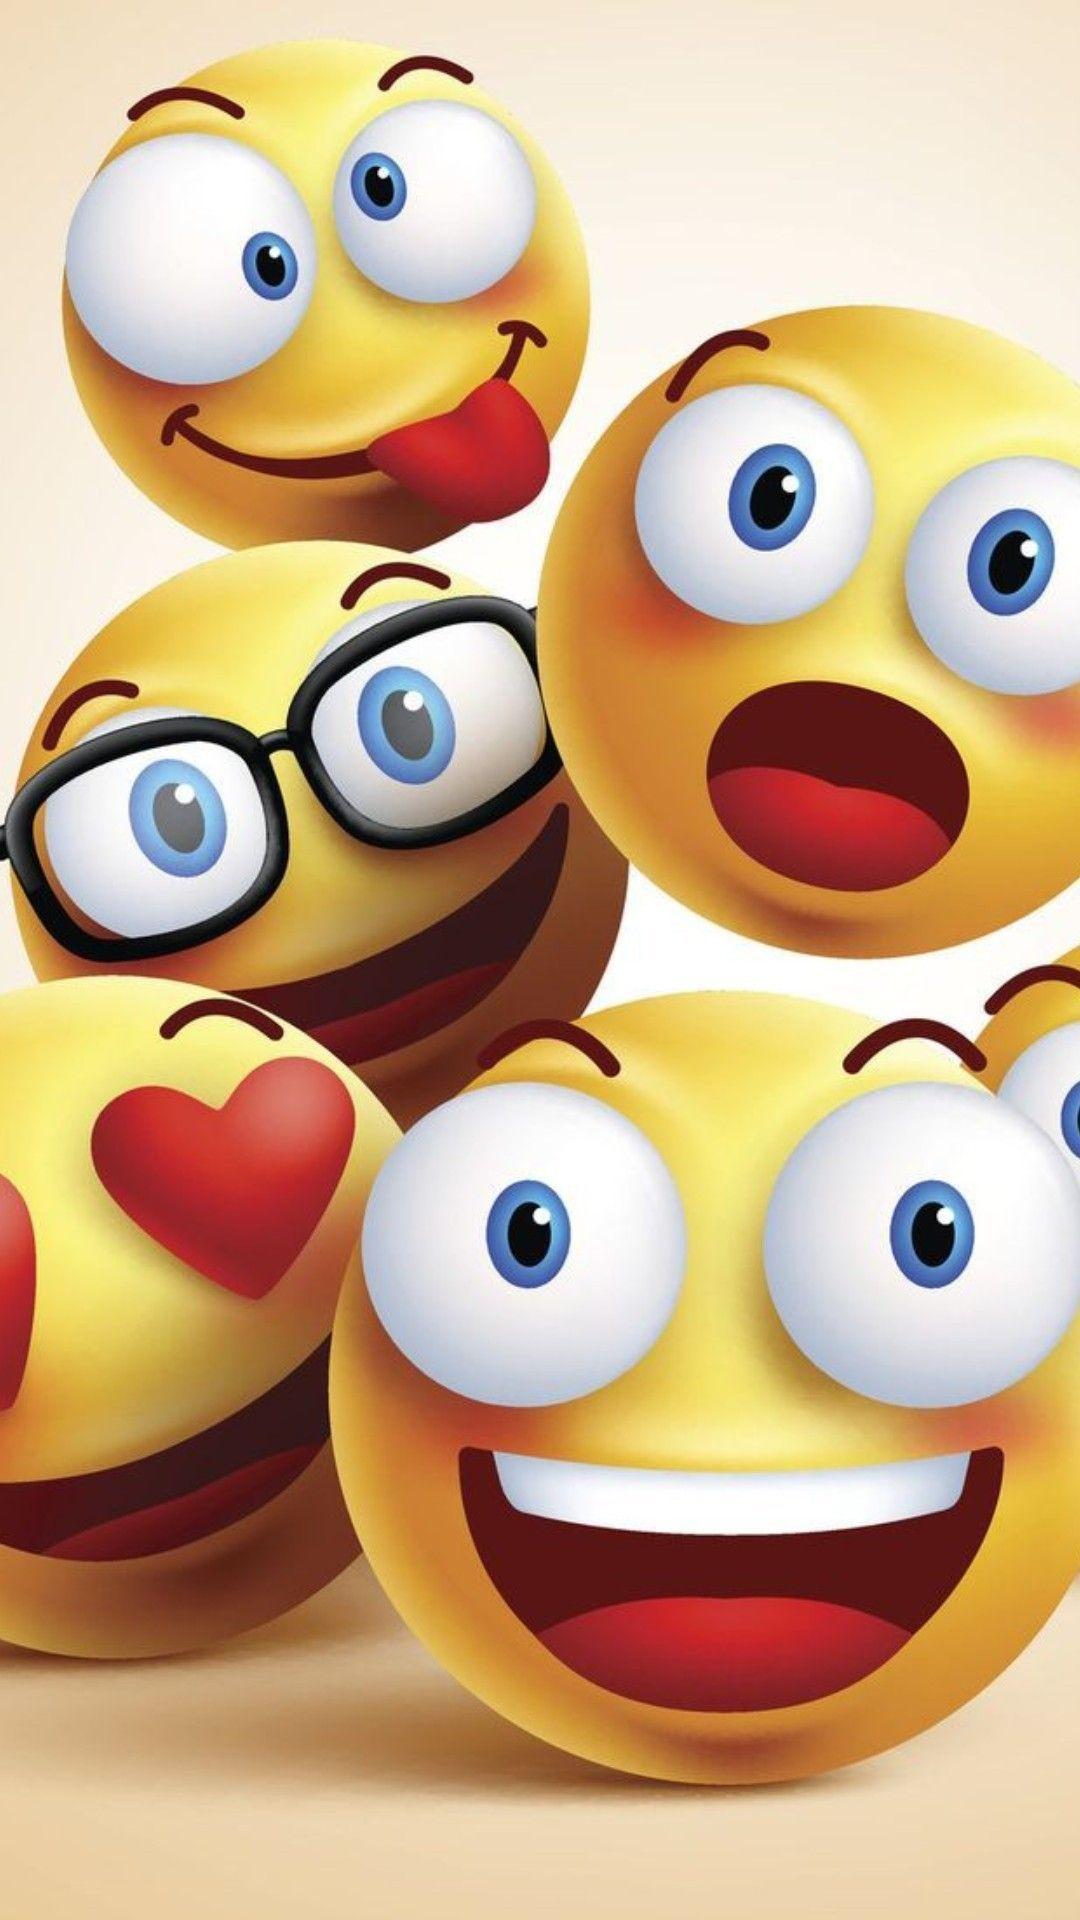 Emoji Background Hupages Download Iphone Wallpapers Emoji Backgrounds Emoji Wallpaper Cute Emoji Wallpaper